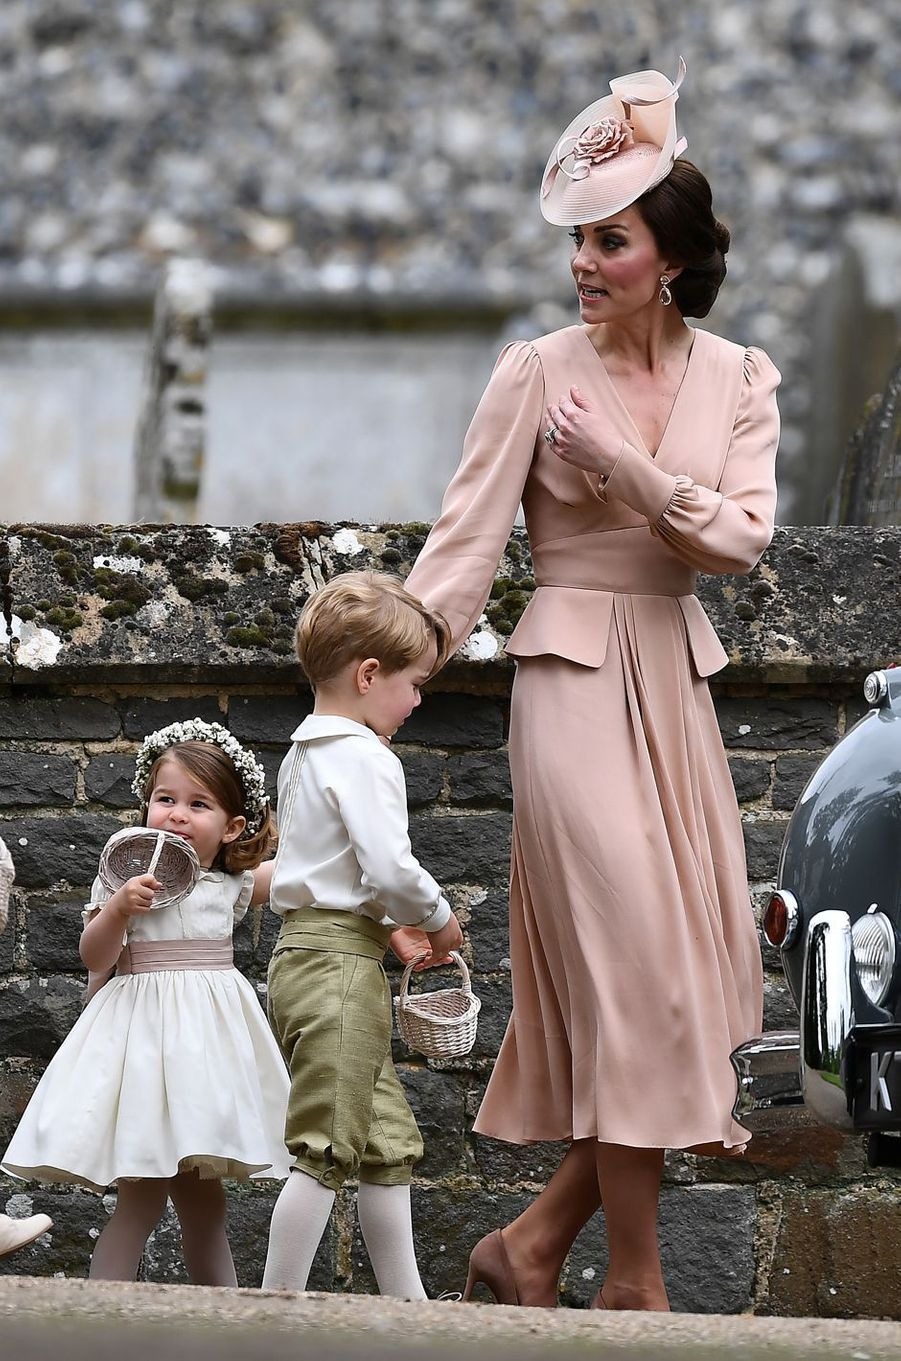 Kate au mariage de sa soeur Pippa Middleton à Englefield, le 20 mai 2017